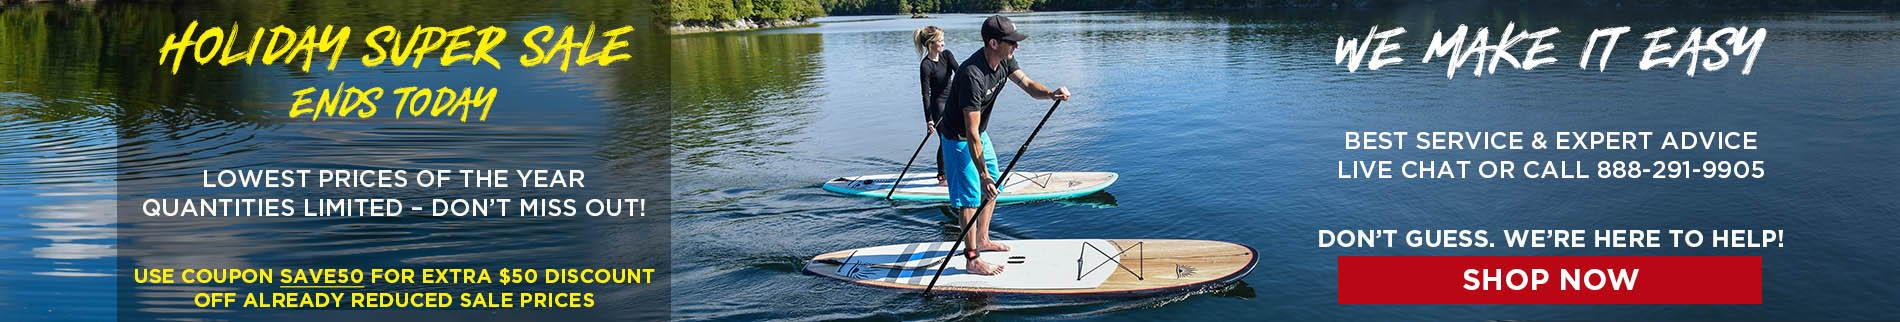 a couple of paddle boarders enjoying a lake